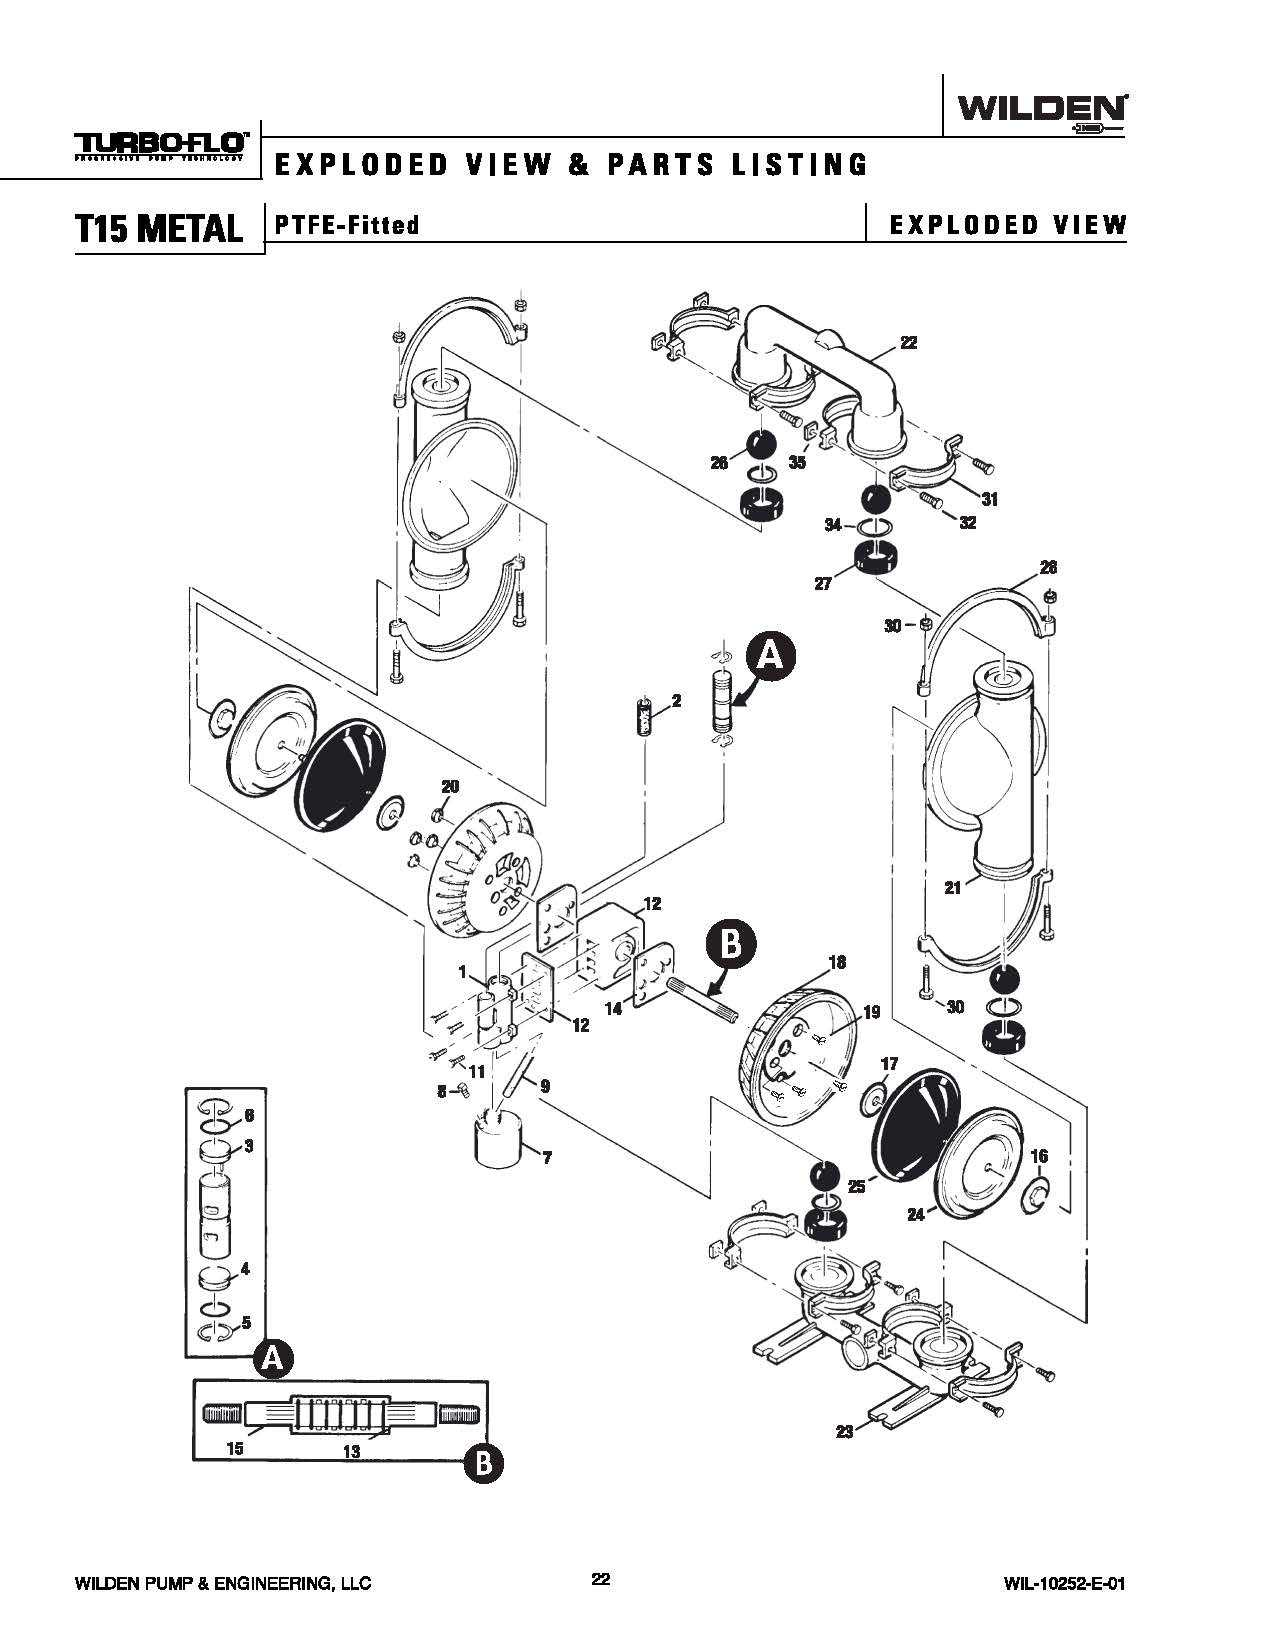 Wilden Pump Parts Breakdown Pictures To Pin